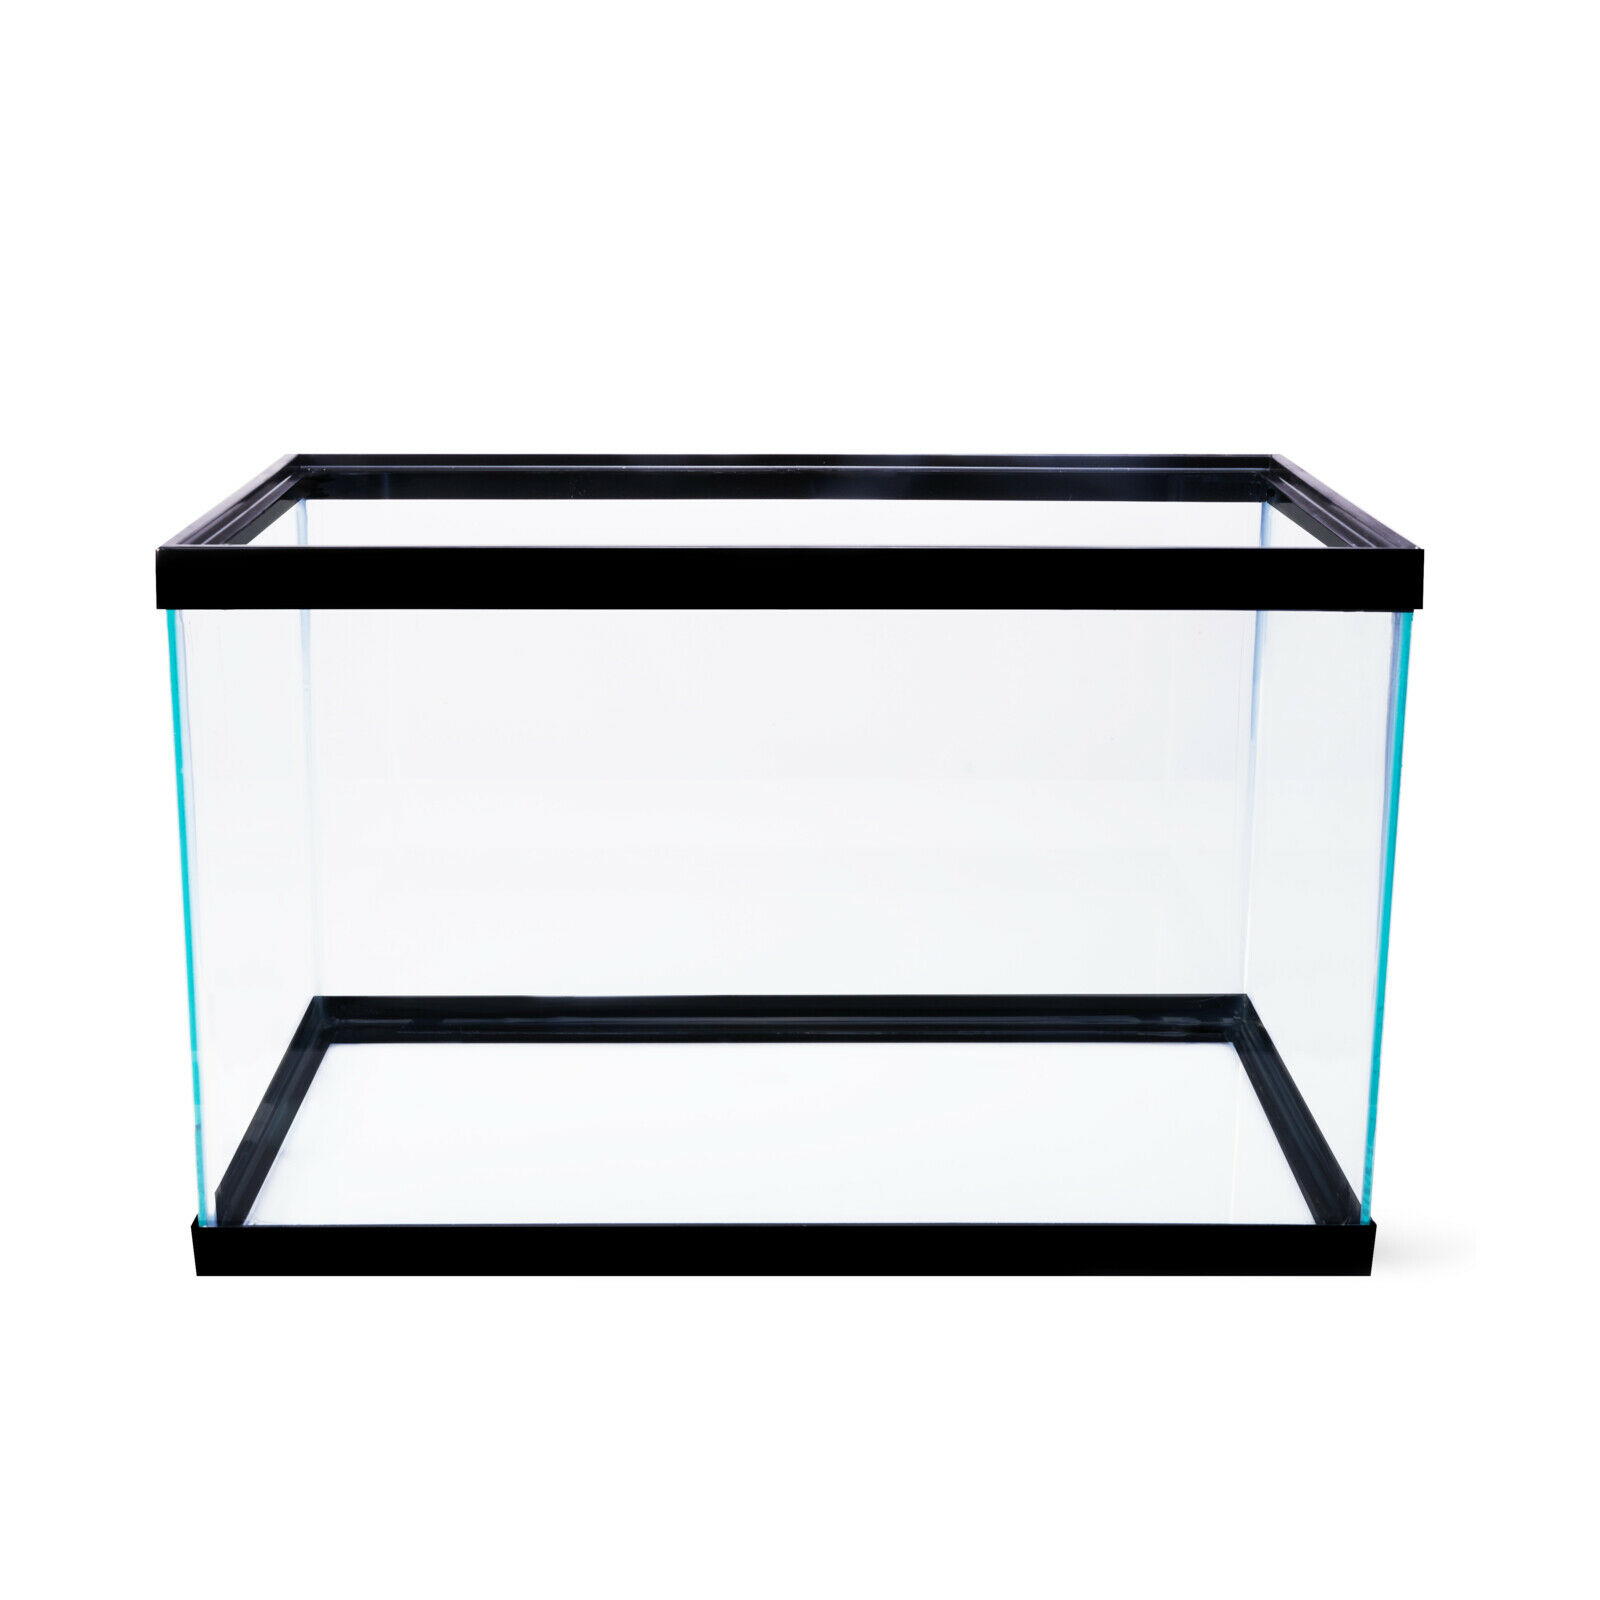 OF Plastic Frame Tank